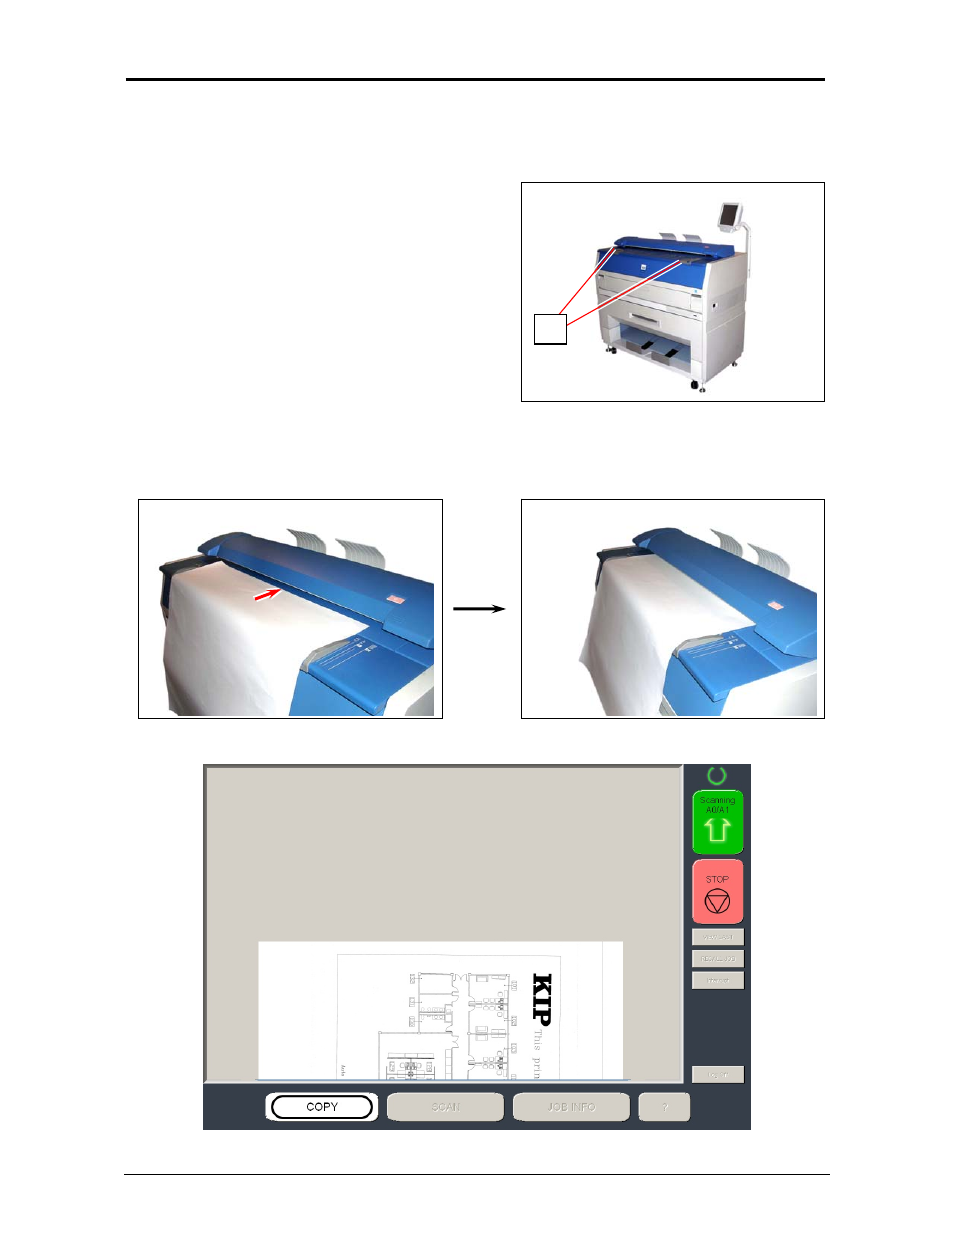 6 copying konica minolta kip 3100 user manual page 35 56 rh manualsdir com konica minolta kip 3100 user manual Install KIP 3100